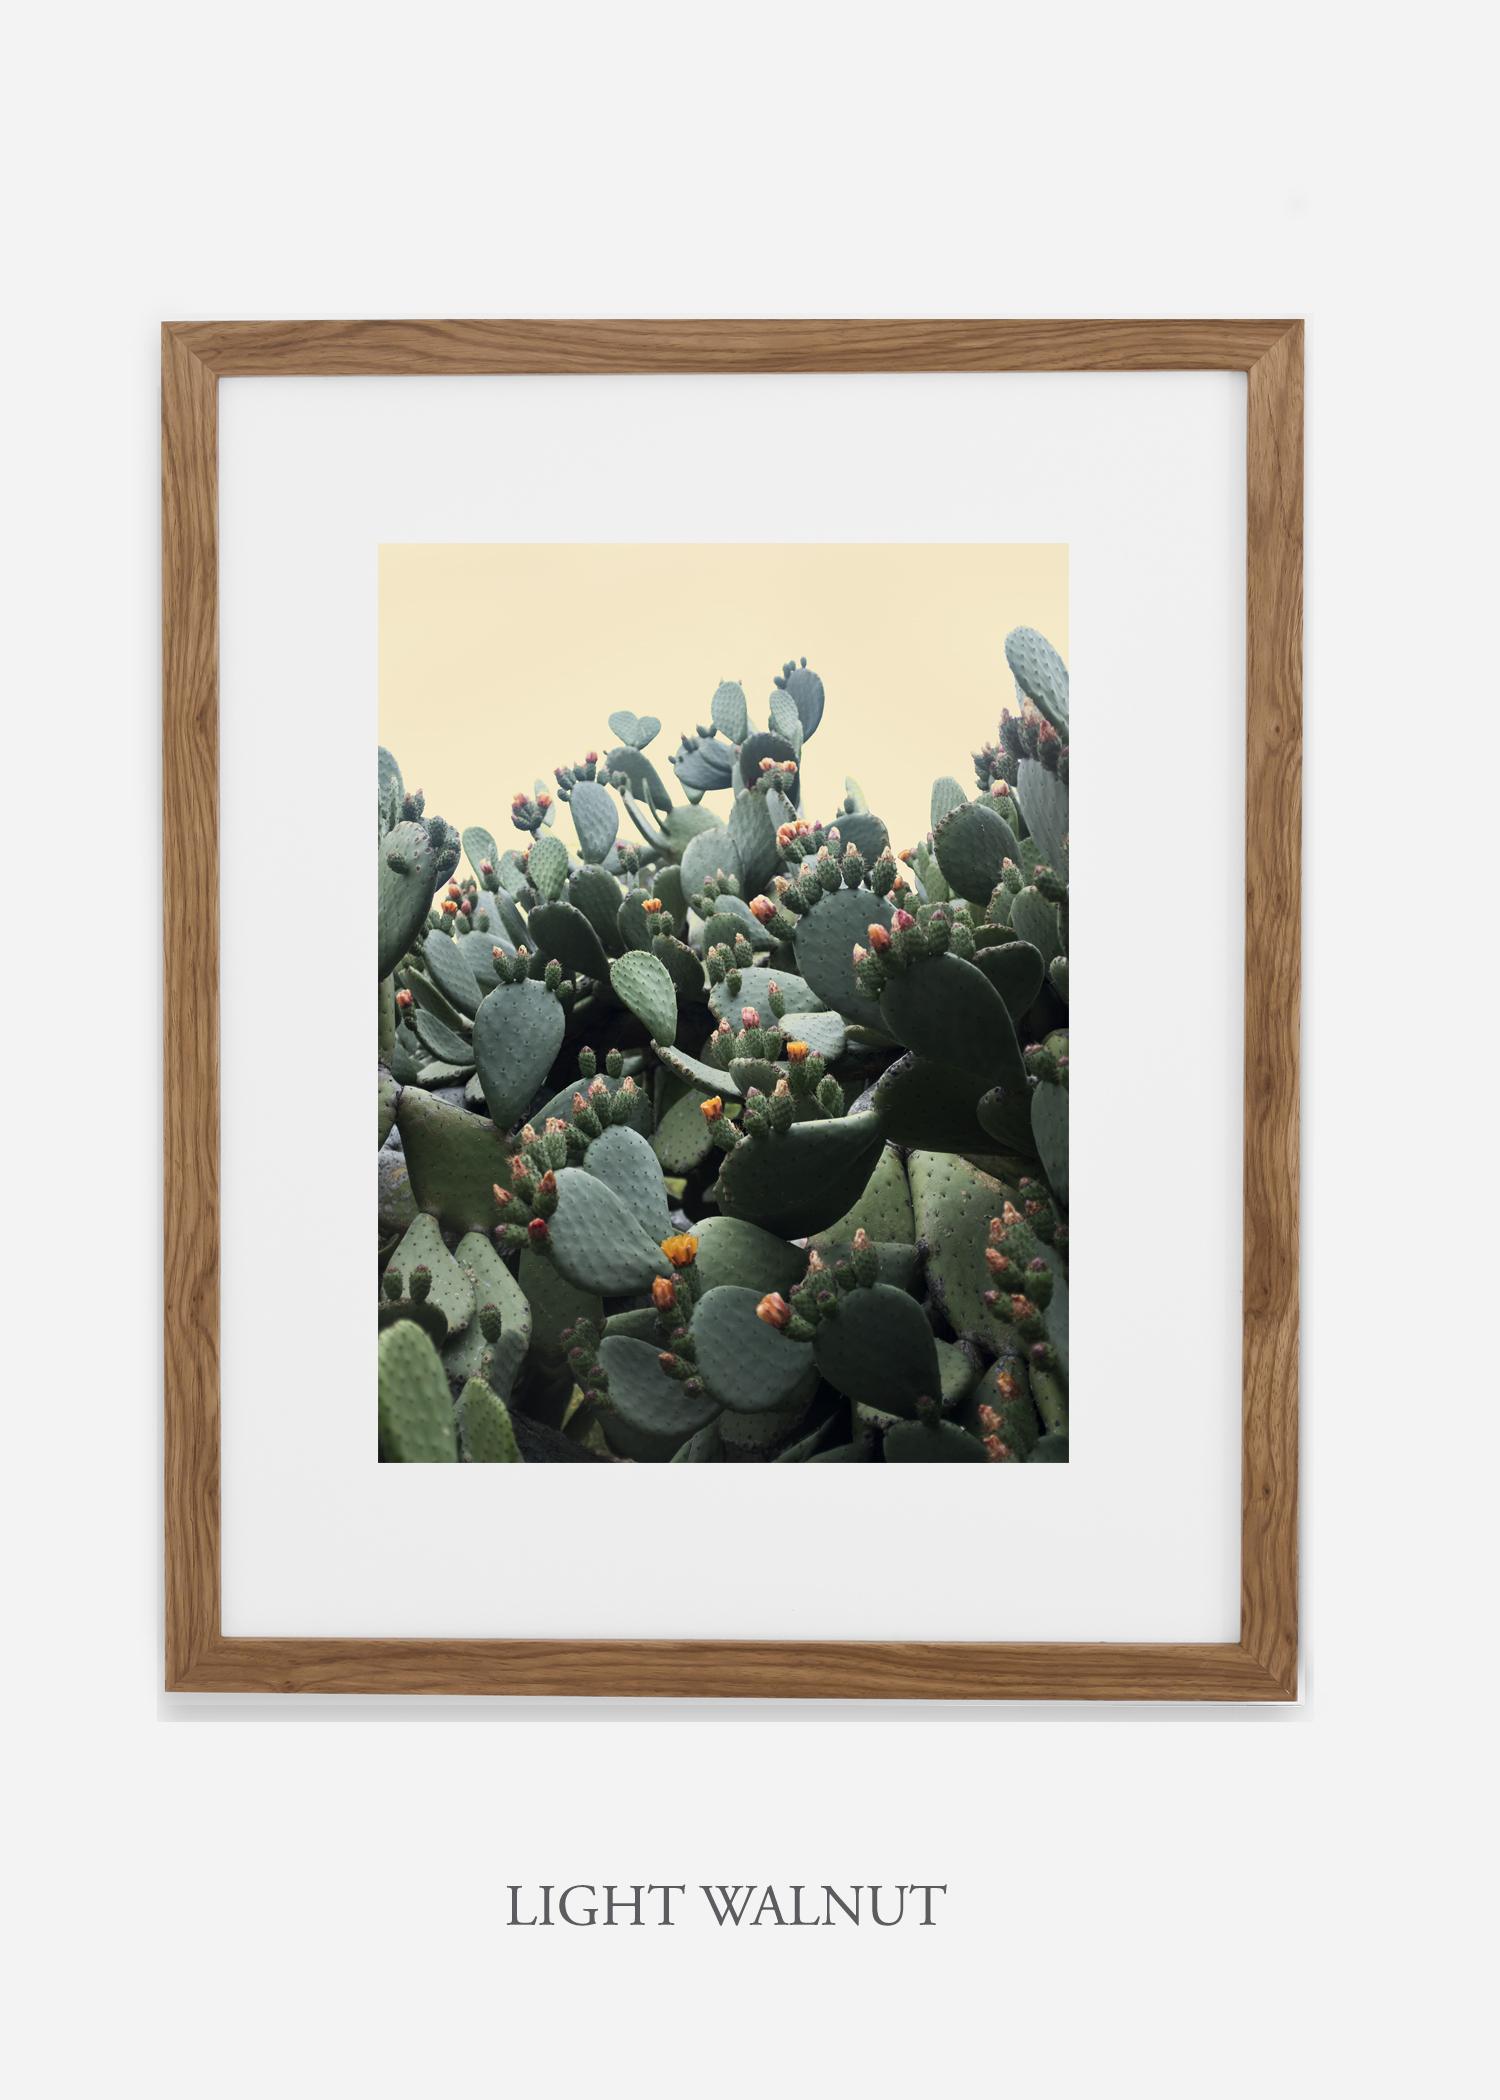 WilderCalifornia_lightwalnutframe_CactusBloom_No1_Art_Photography_interiordesign_agave.jpg